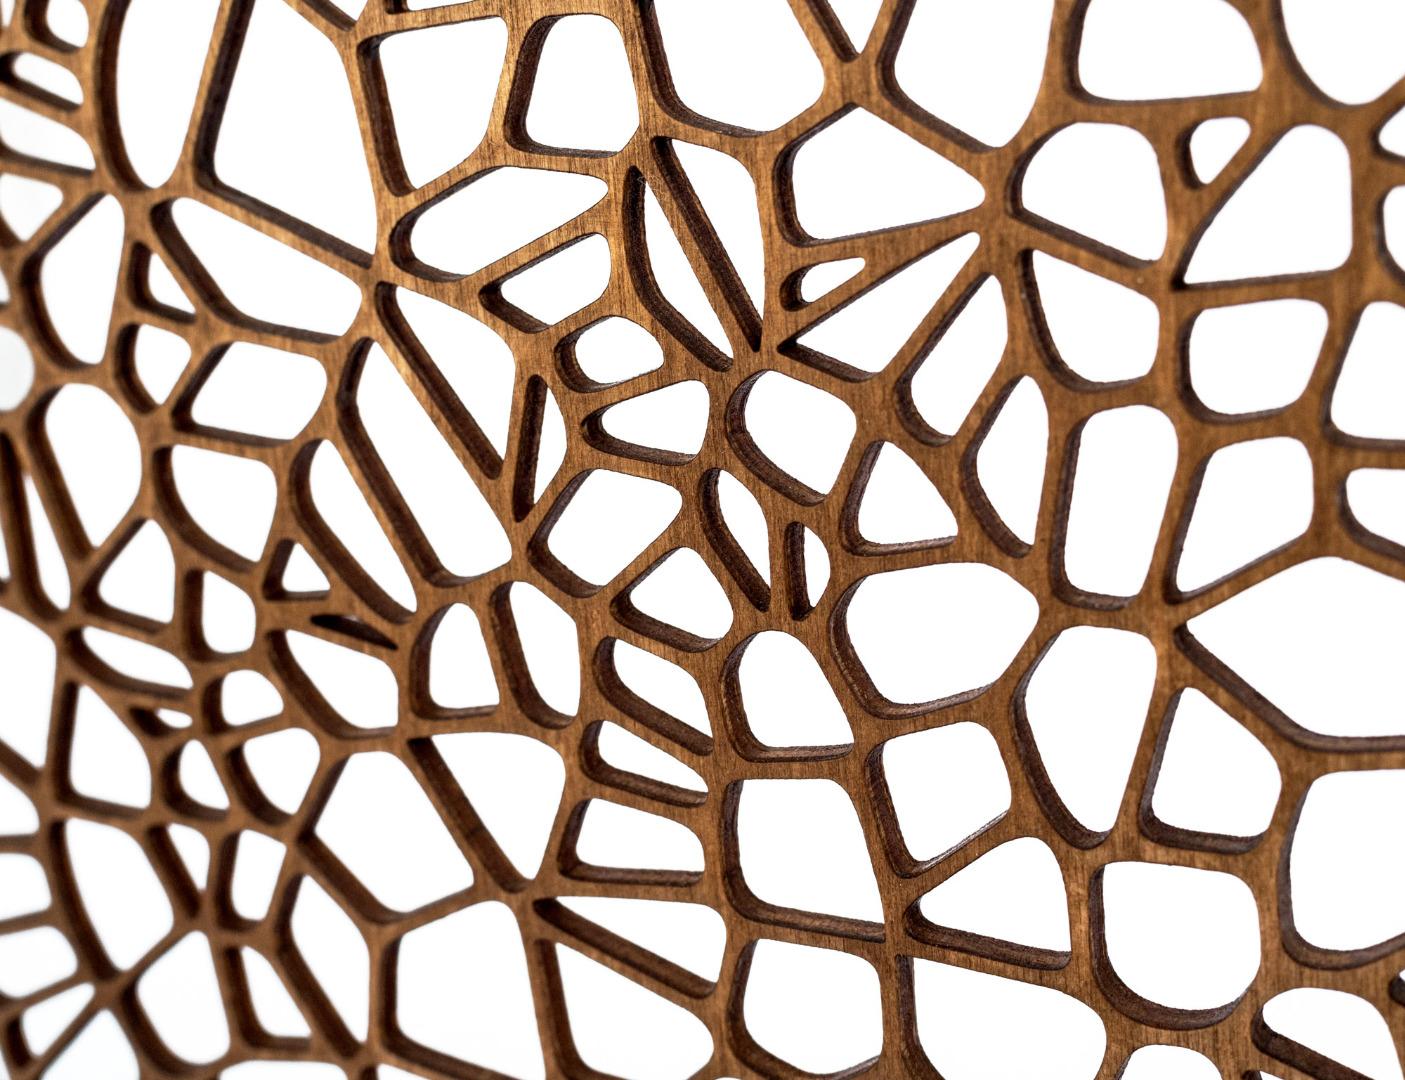 Ohrringhalter aus Holz ORGANIC II 9